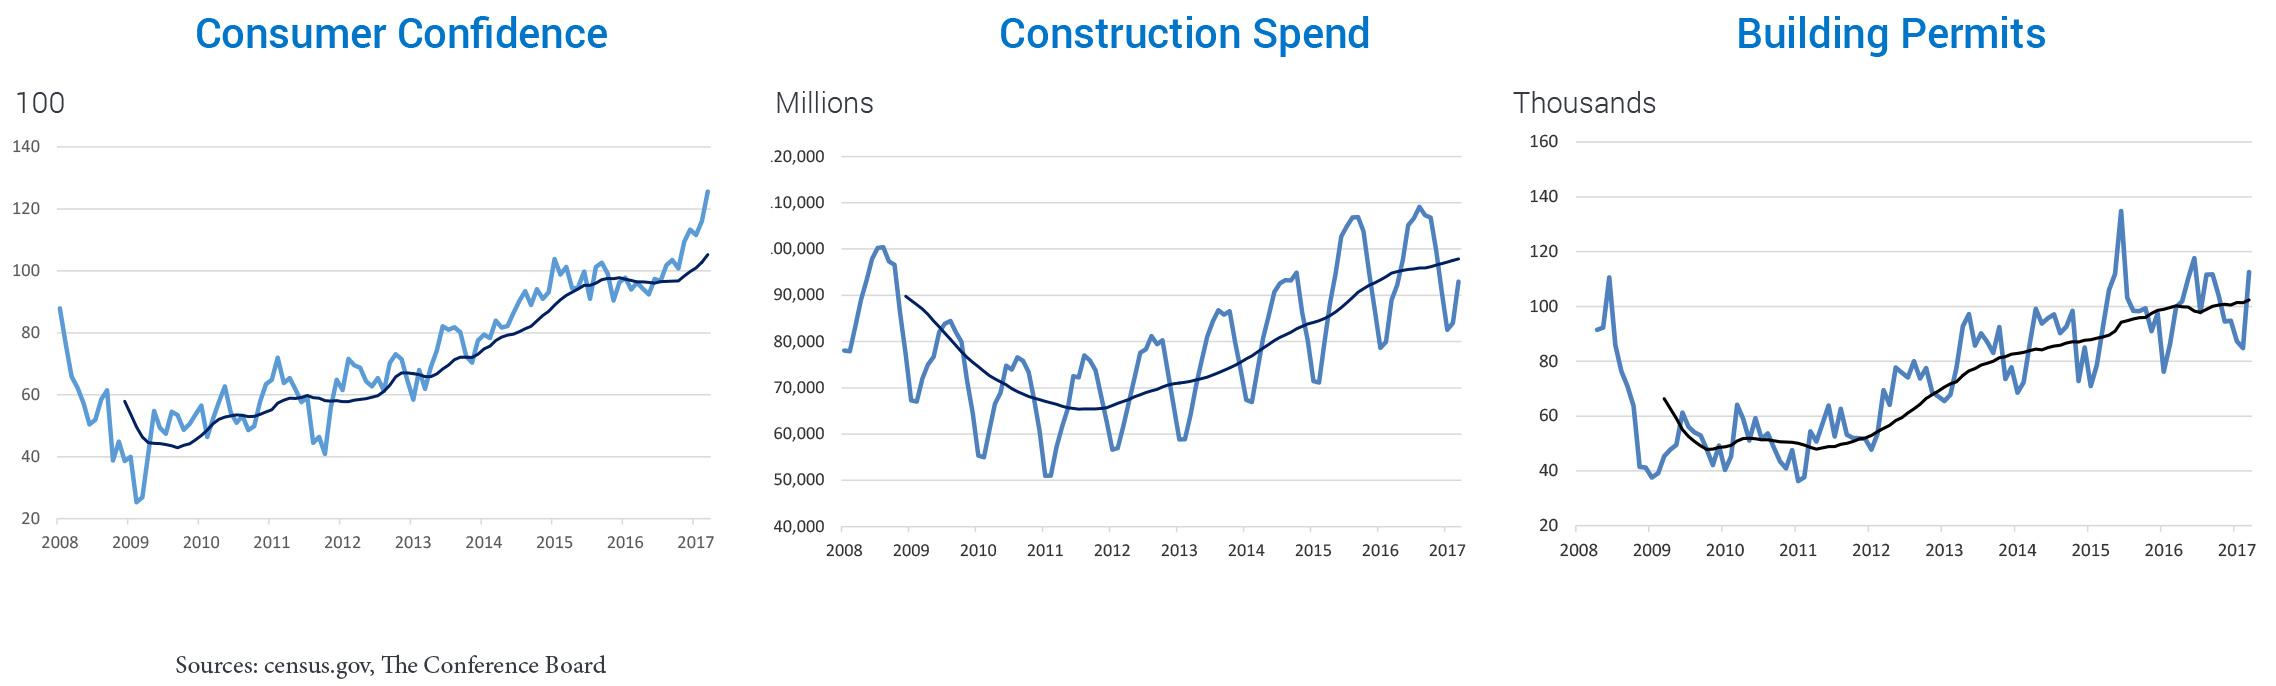 Consumer Confidence, Construction Spend, Building Permits